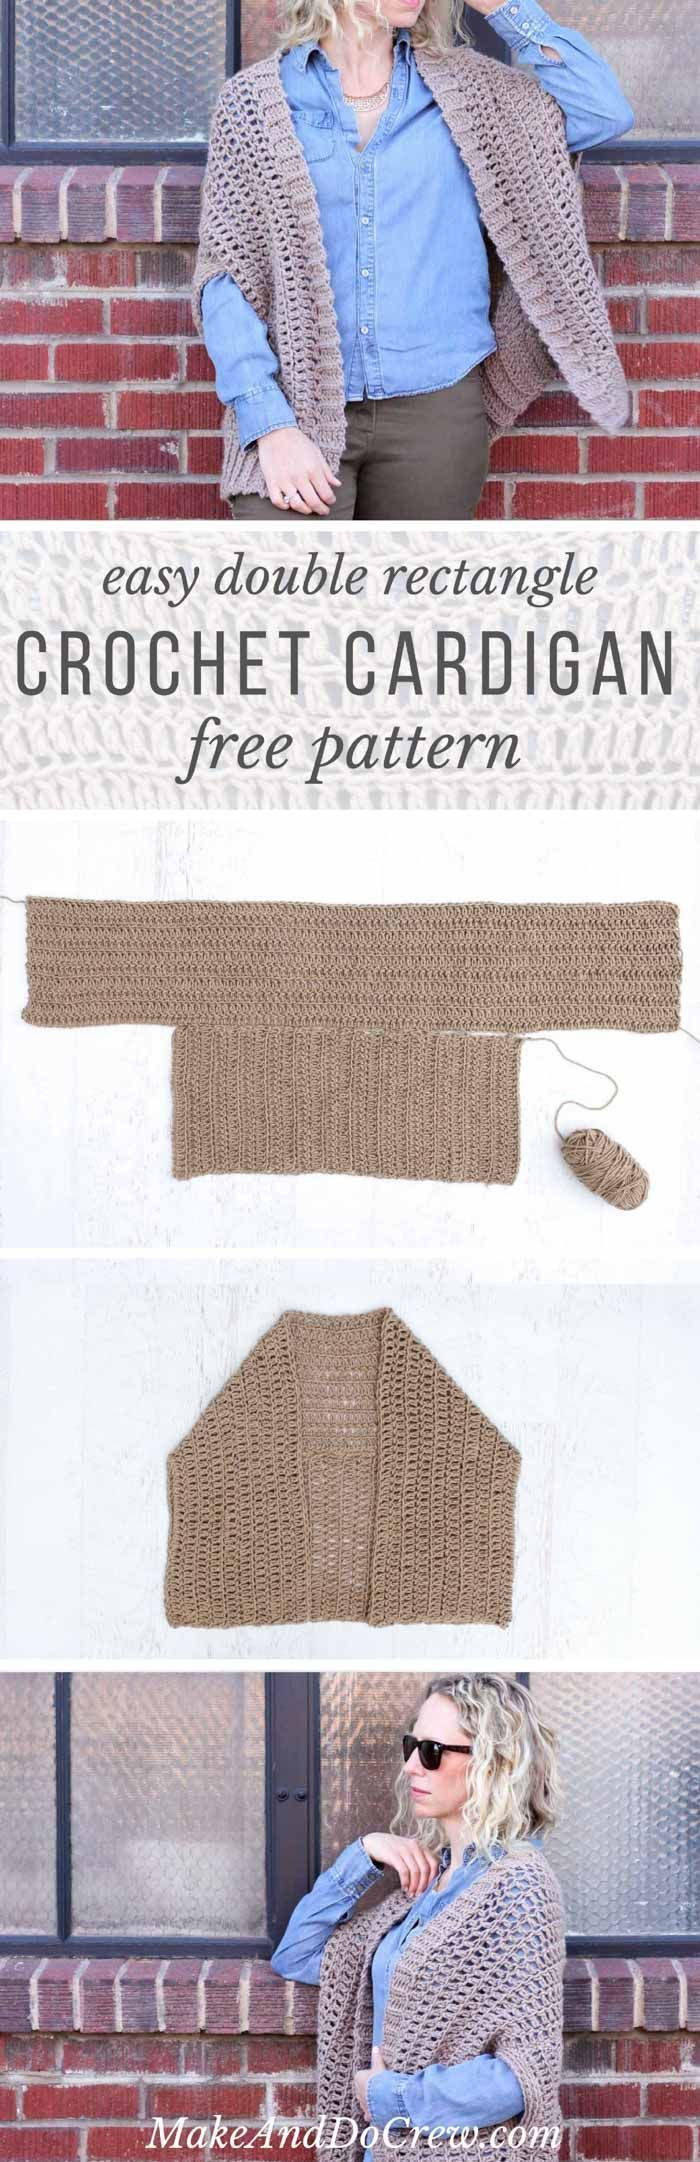 Cocoon Cardigan Free Crochet Pattern | Patrones para suéter ...